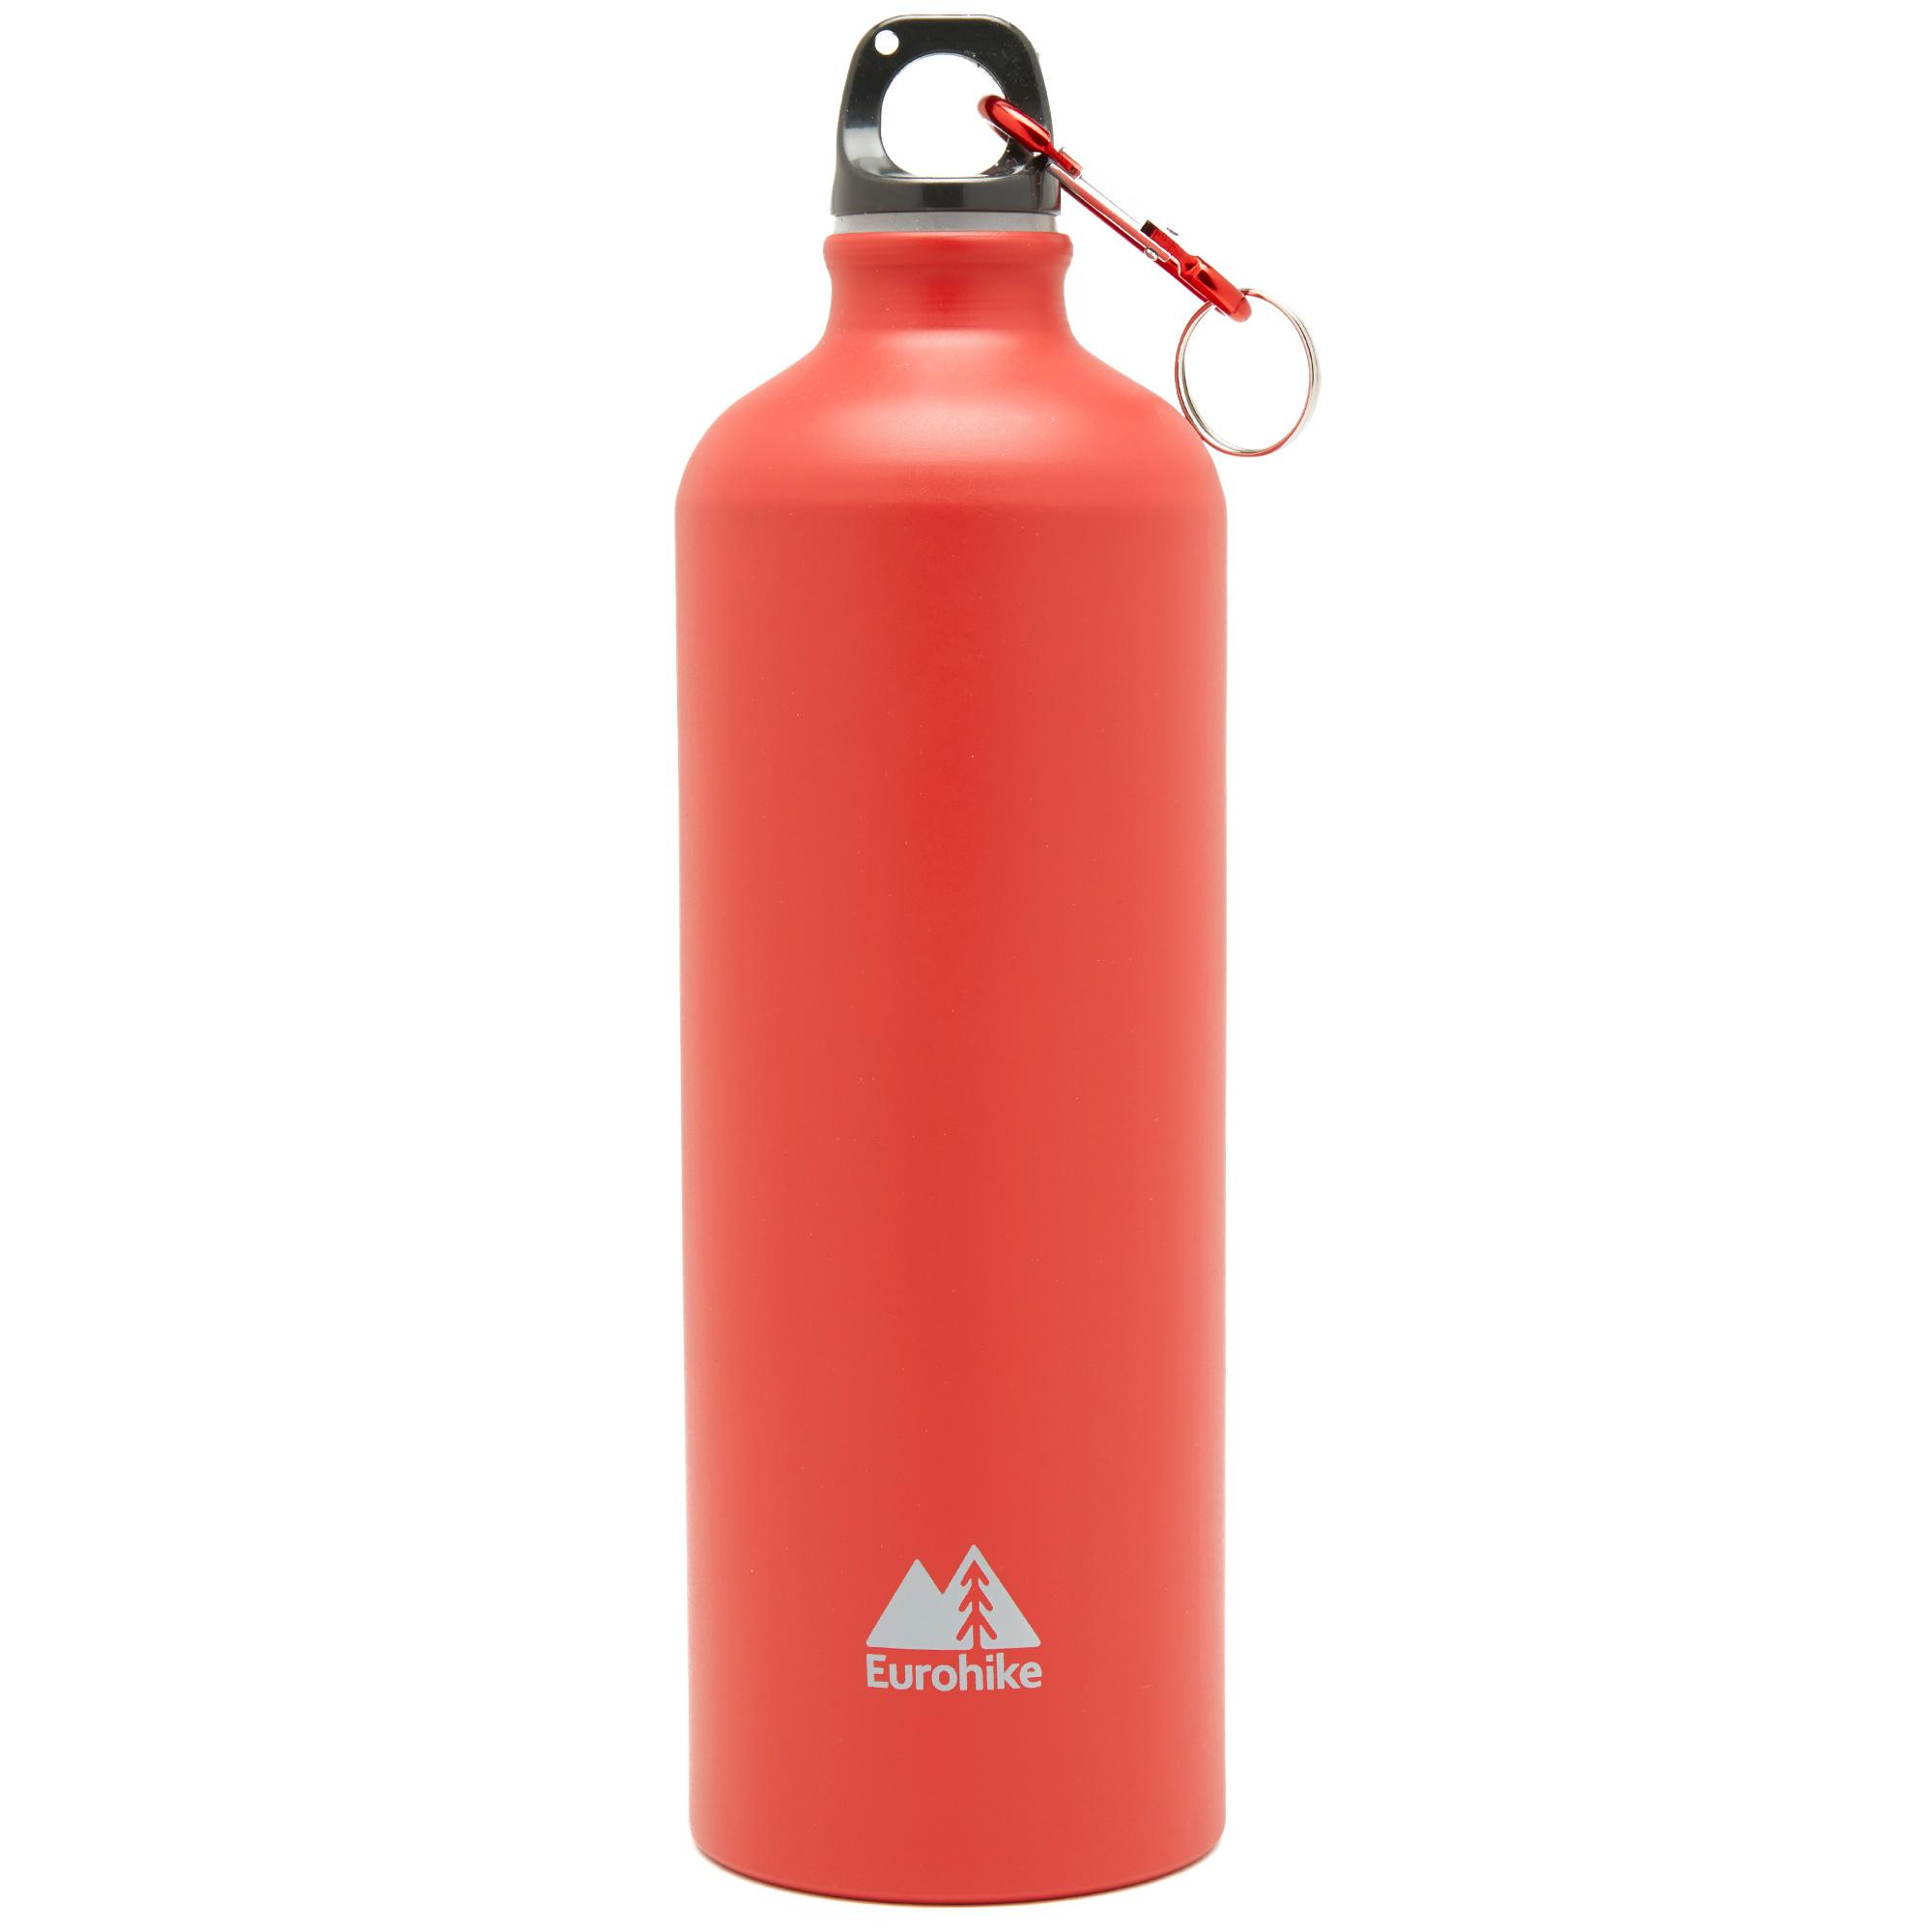 Eurohike Aqua 1l Aluminium Bottle - Red/red  Red/red